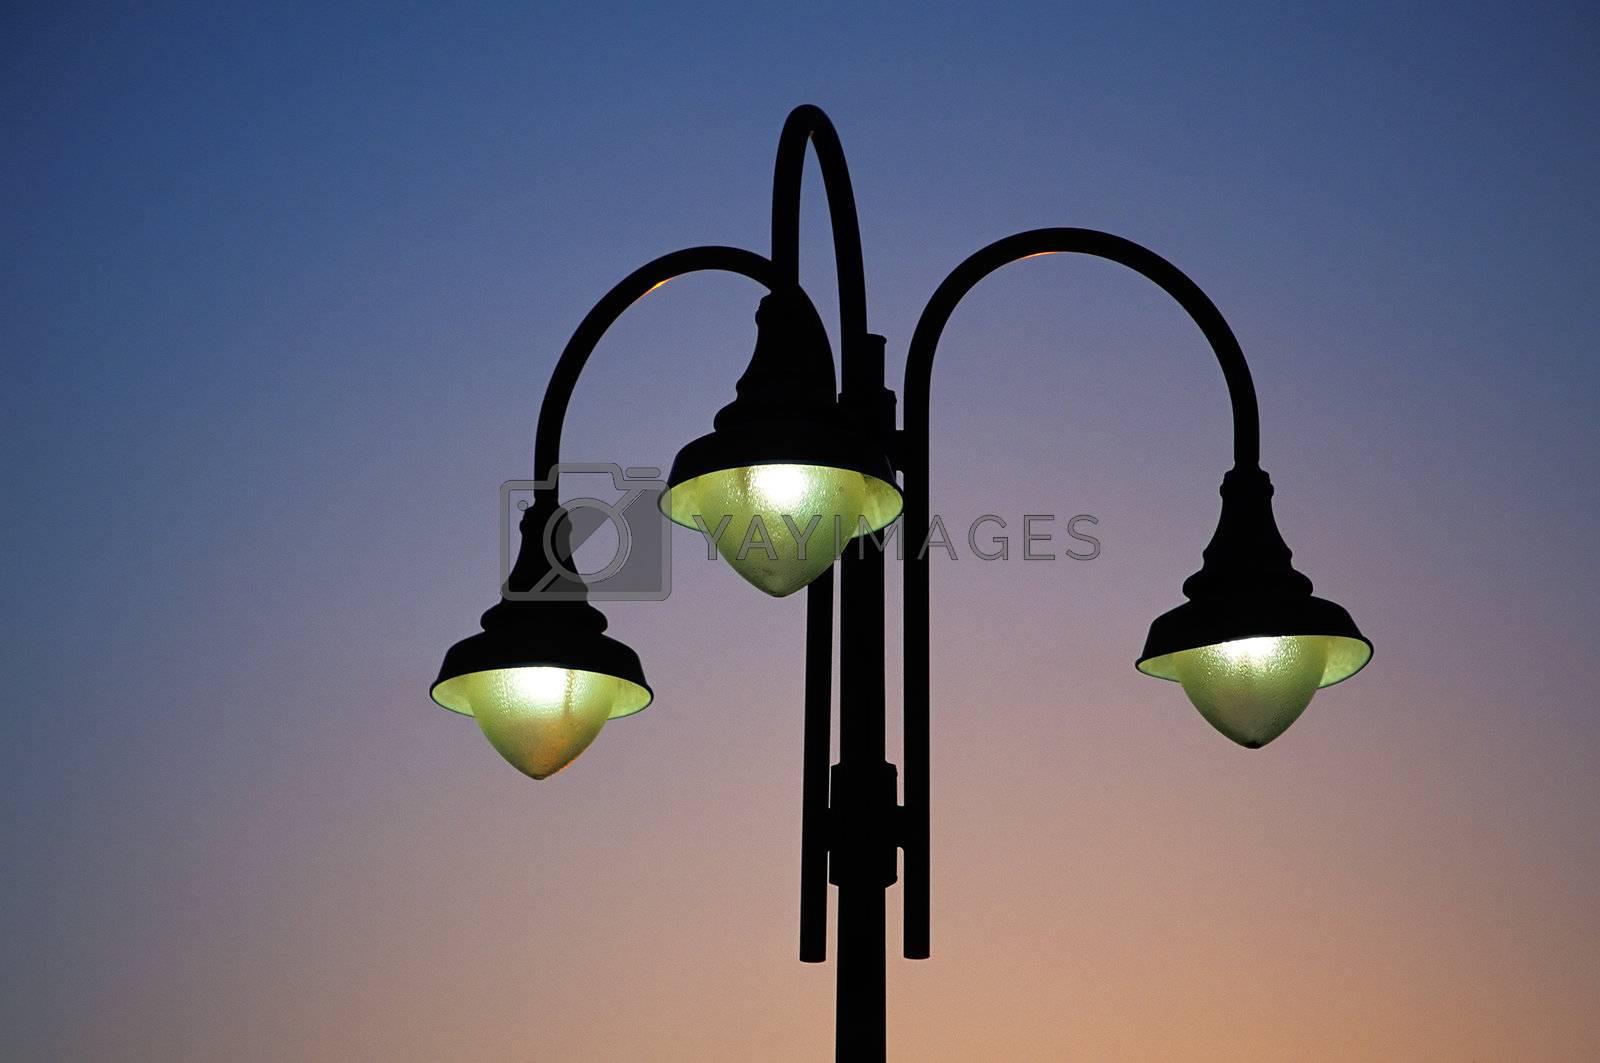 Three street lights in a city park